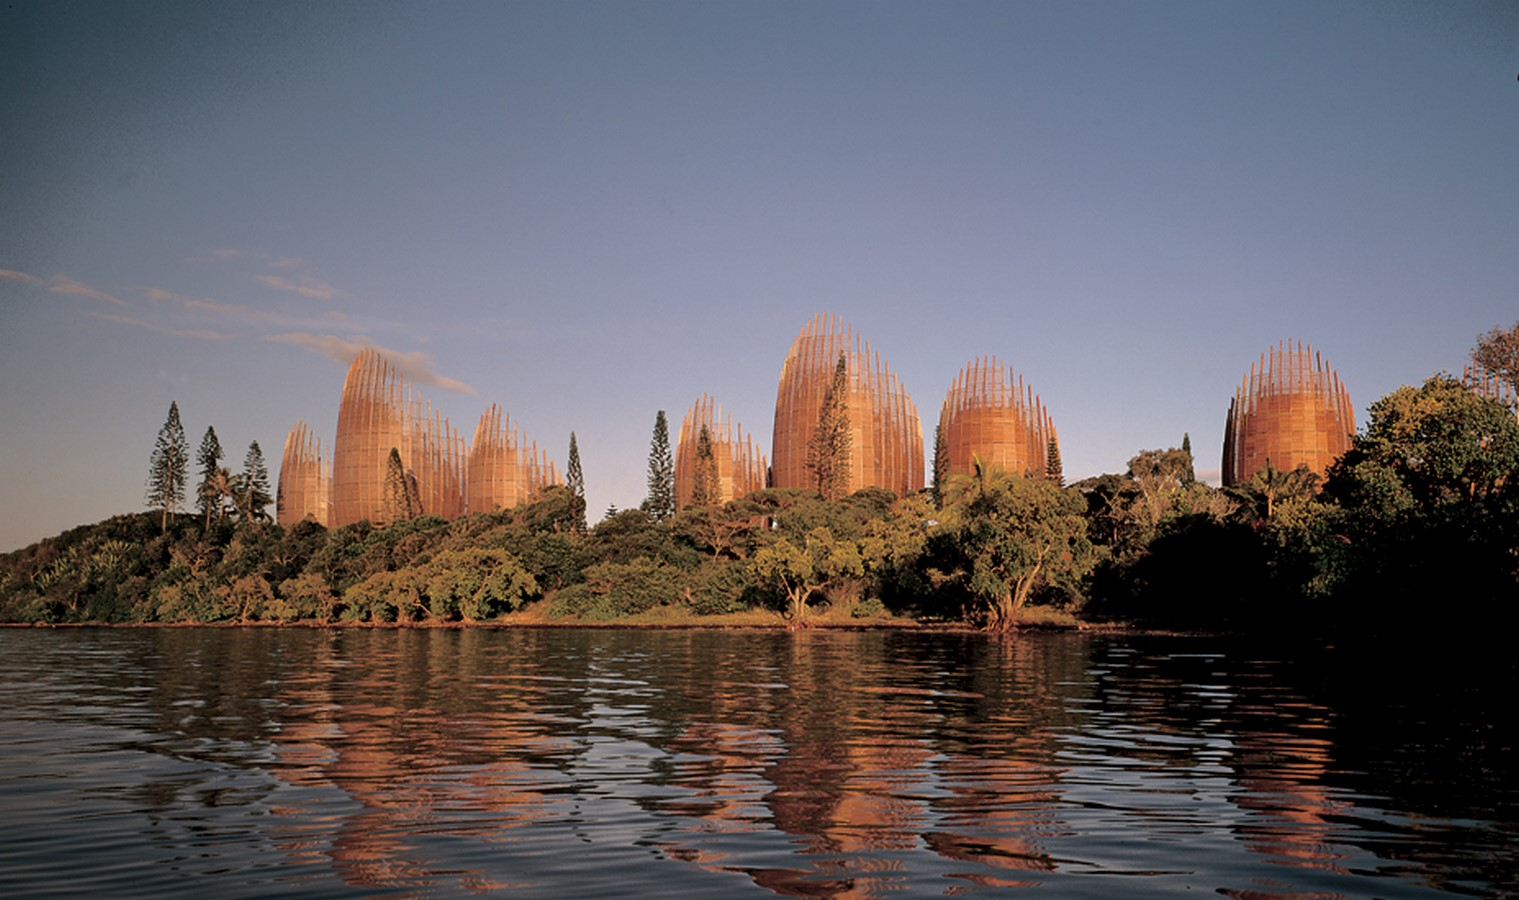 Jean-Marie Cultural Center by Renzo Piano: Symbolizing the Kanak civilization - sheet 4